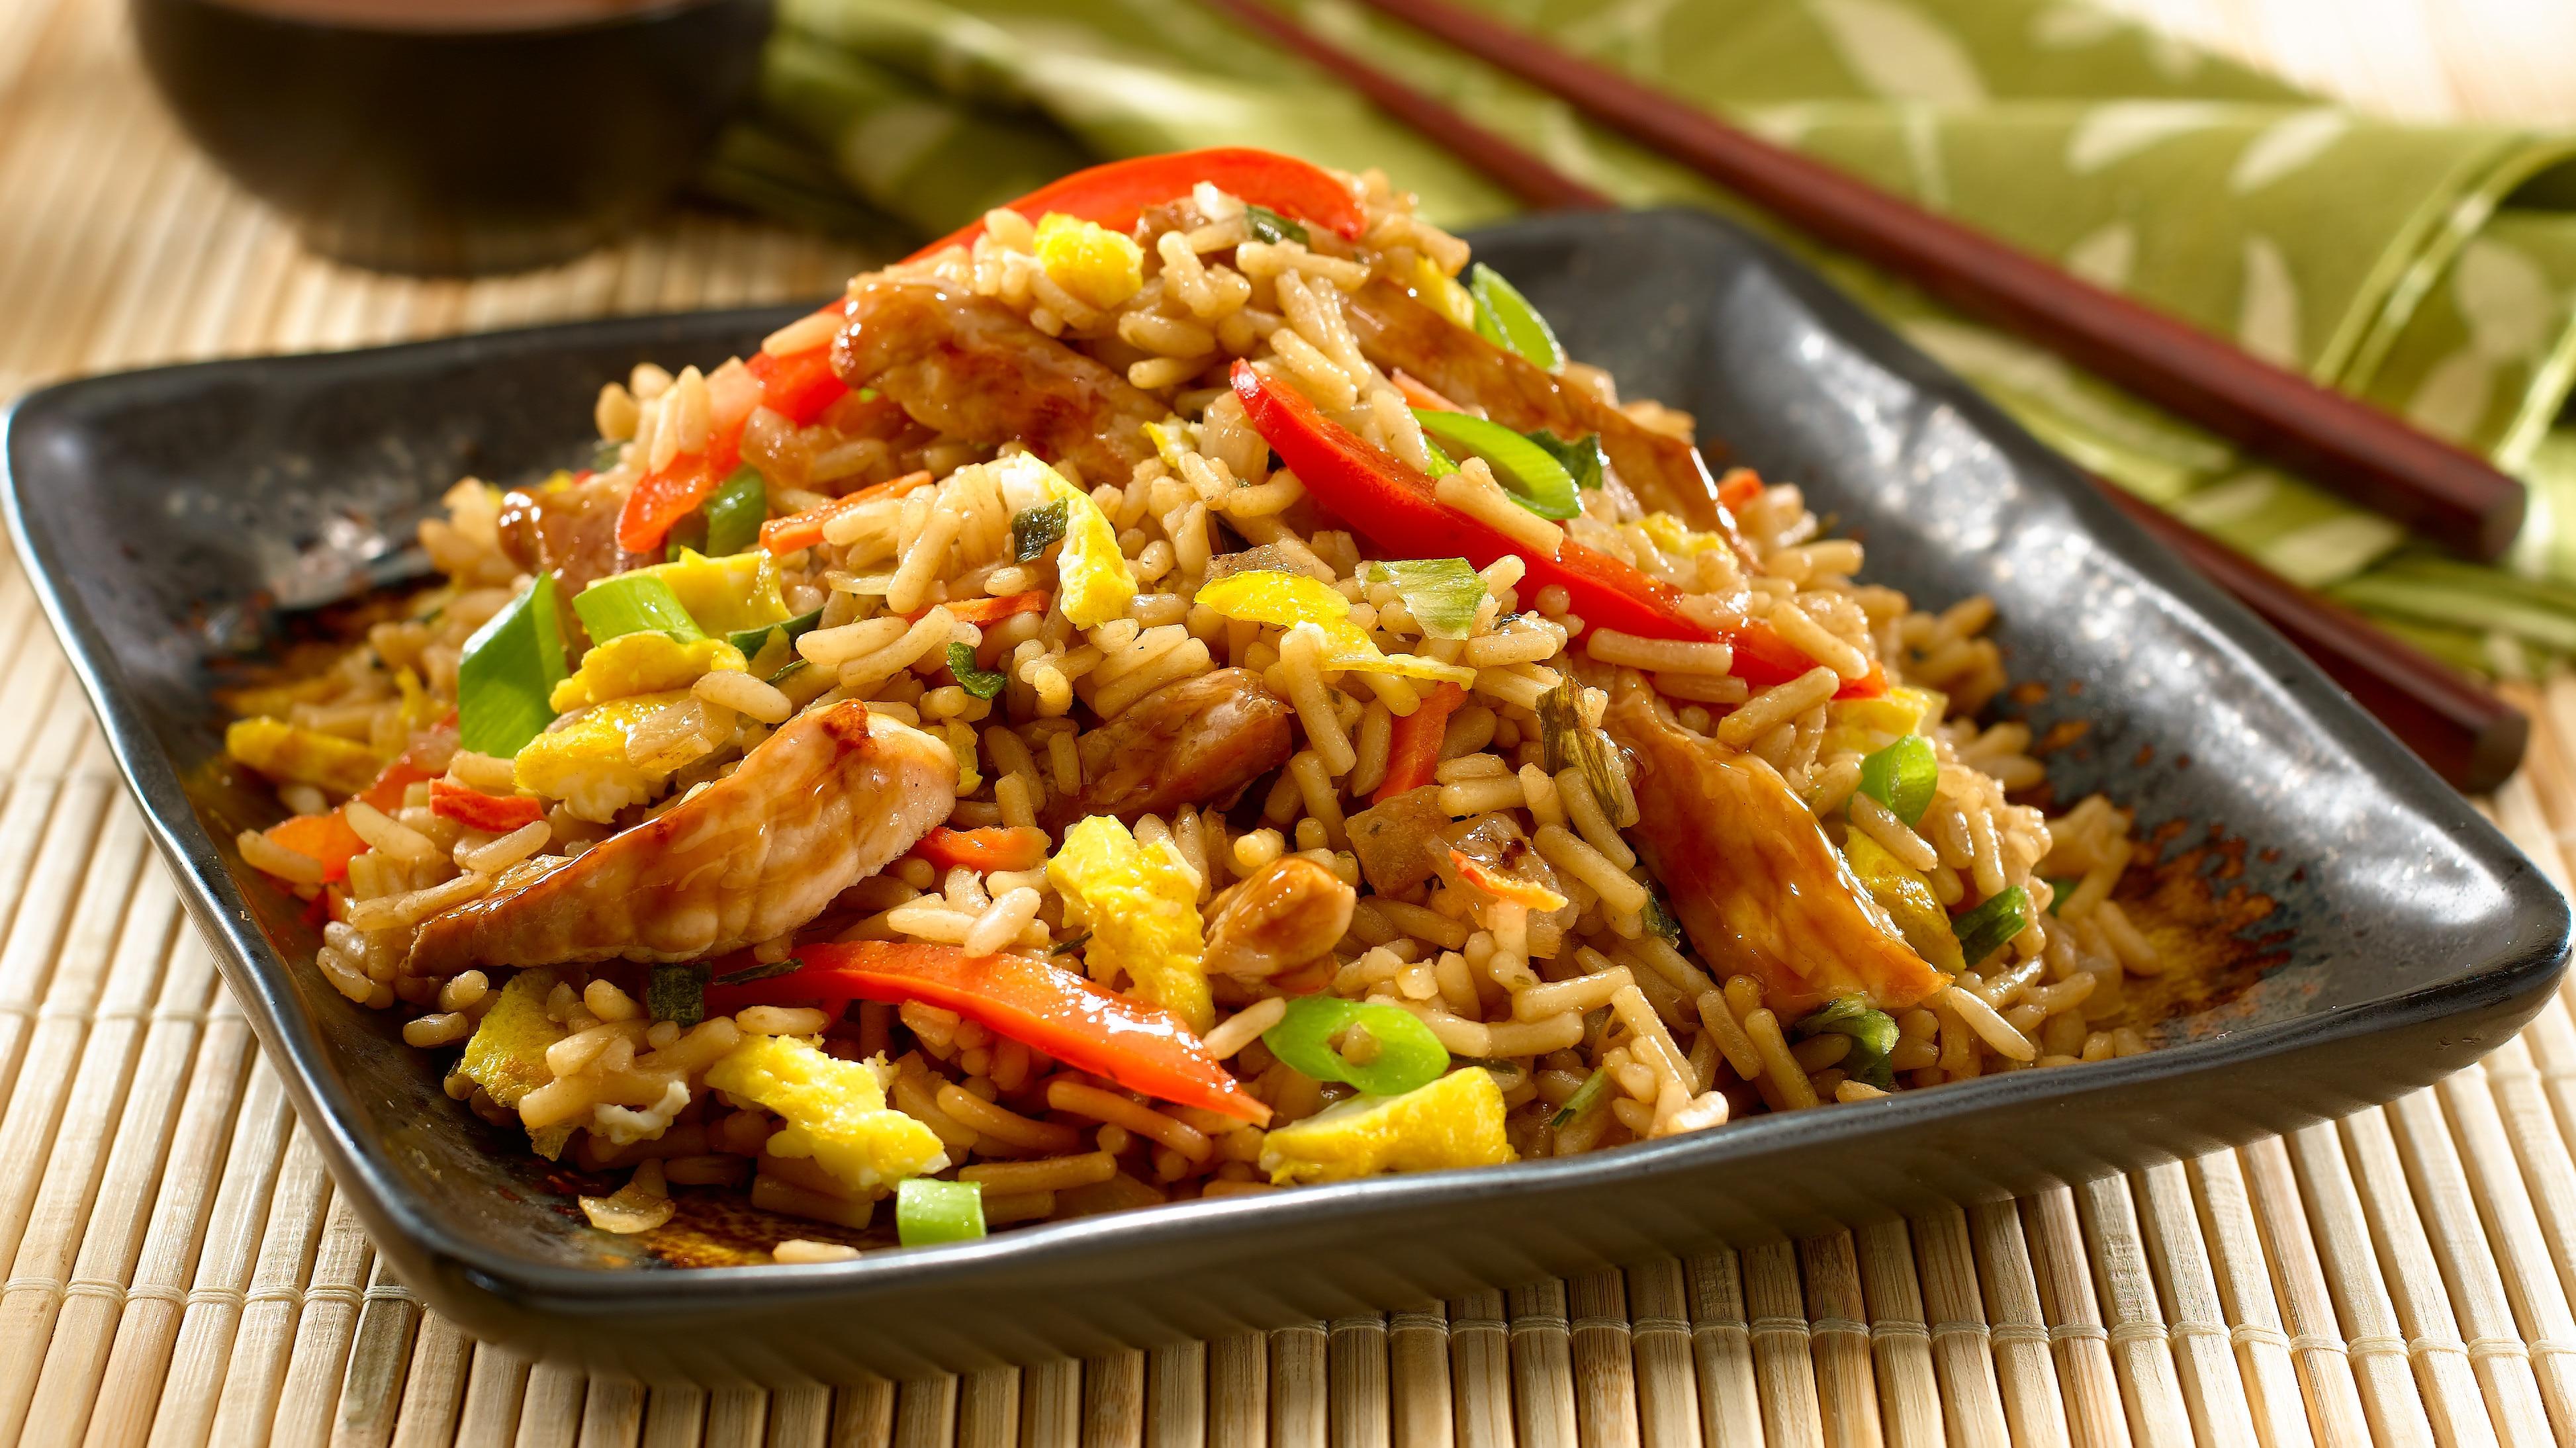 Teriyaki Pork Fried Rice Dinner